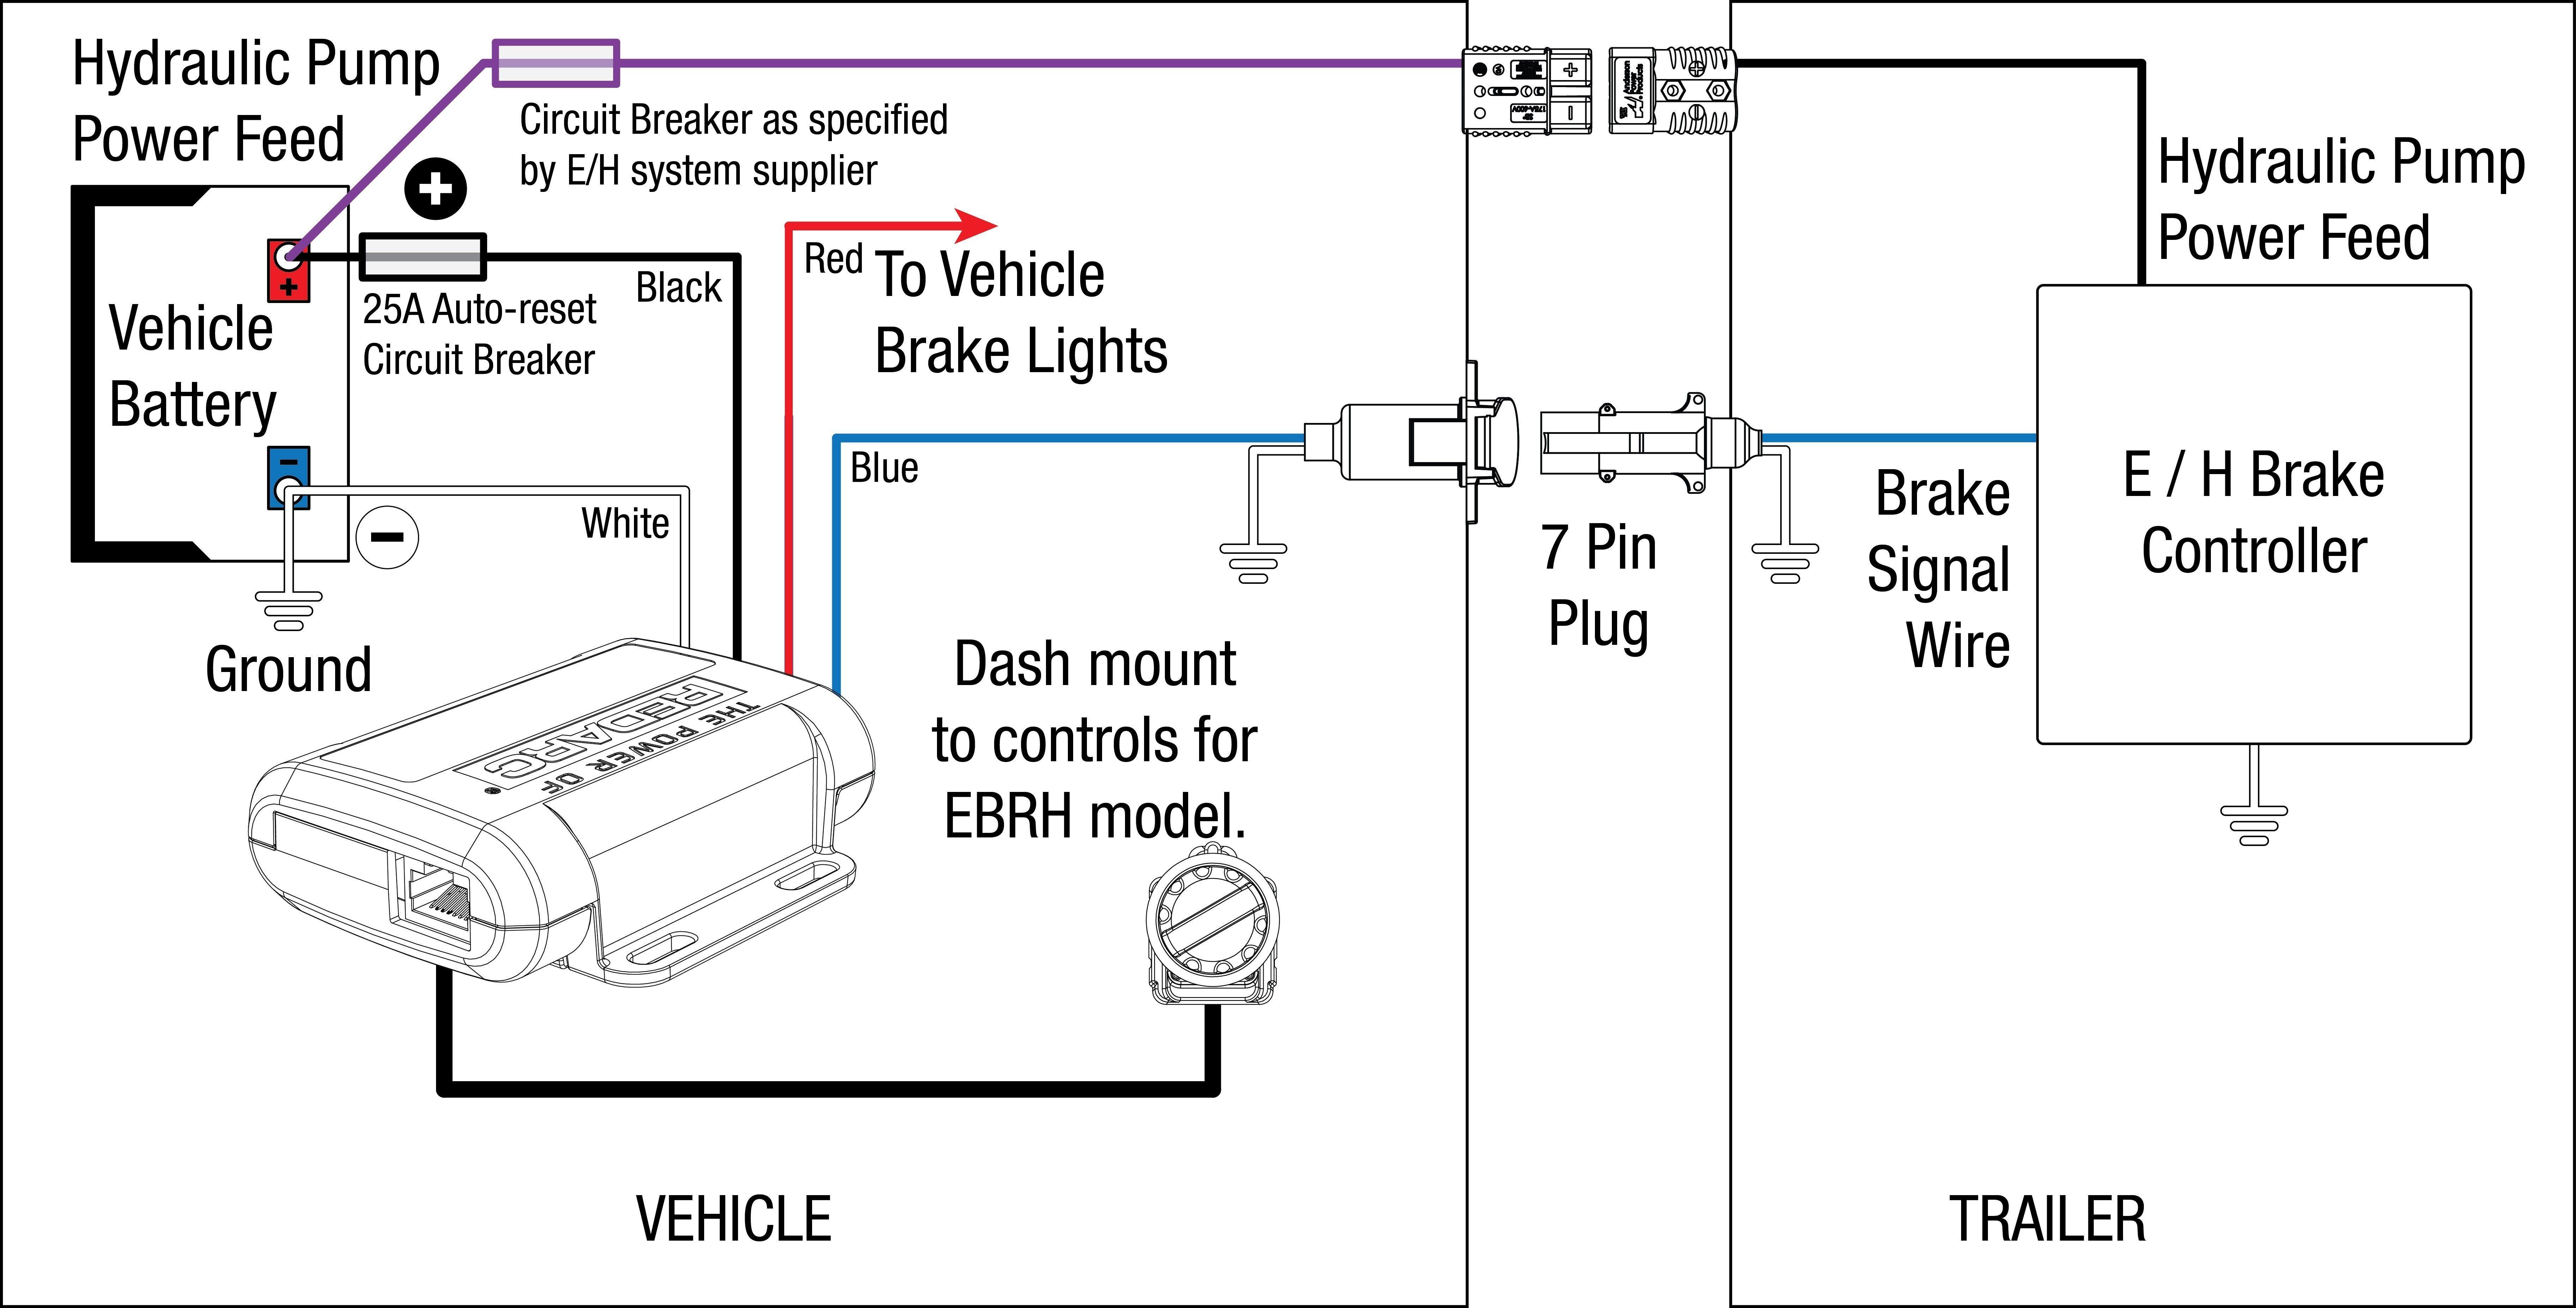 New Mk Emergency Key Switch Wiring Diagram Diagram Diagramsample Diagramtemplate Wiringdiagram Diagramchart Worksheet Diagram Car Trailer Diagram Design